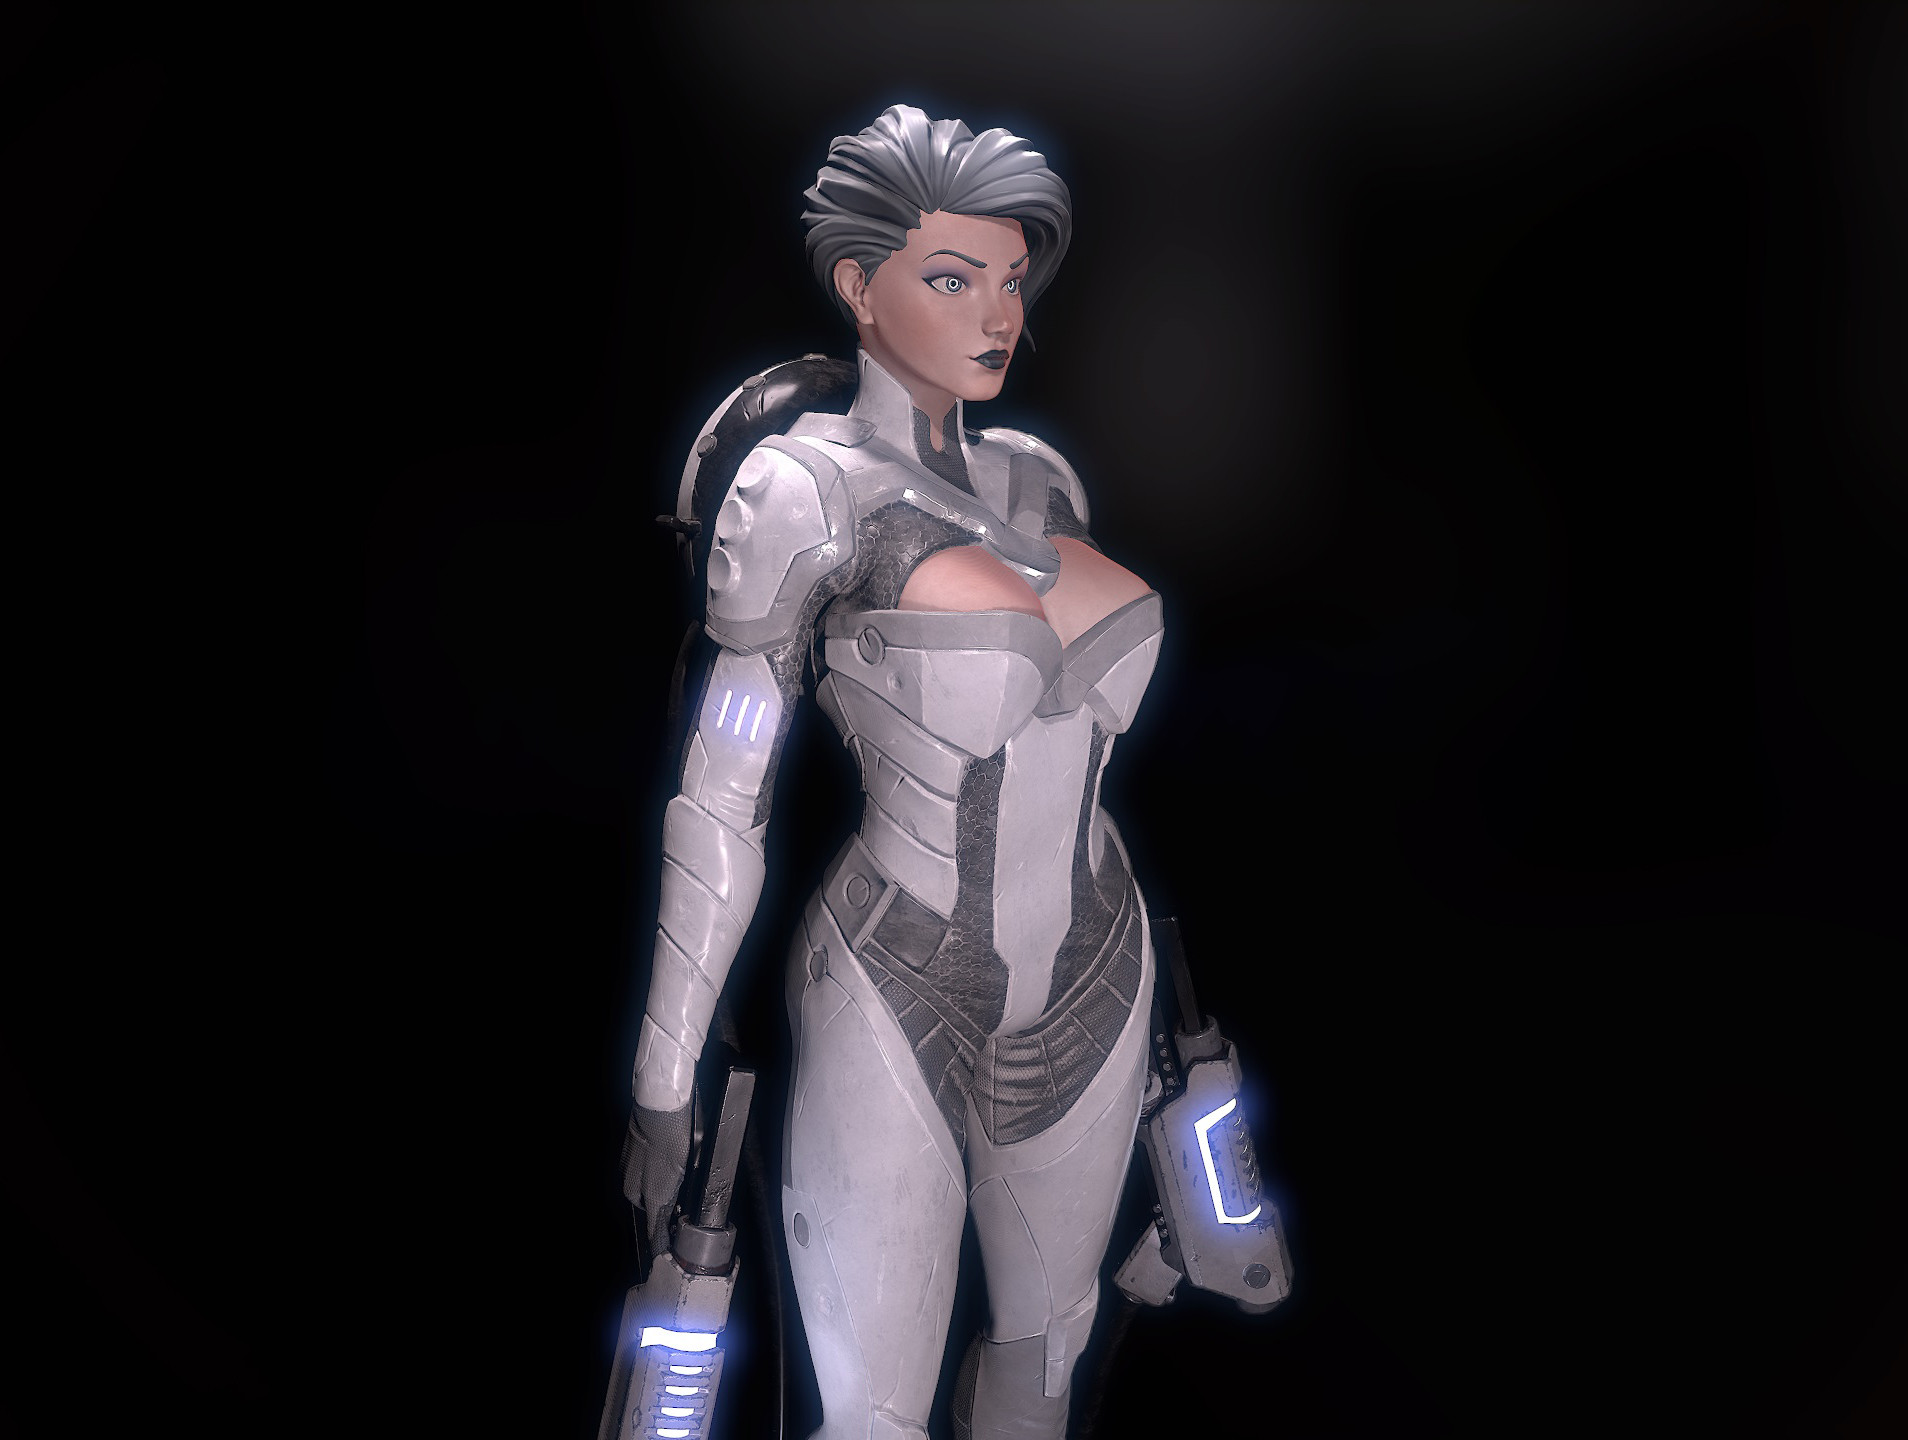 Eren ozel cinder scifi costume design 32 161206